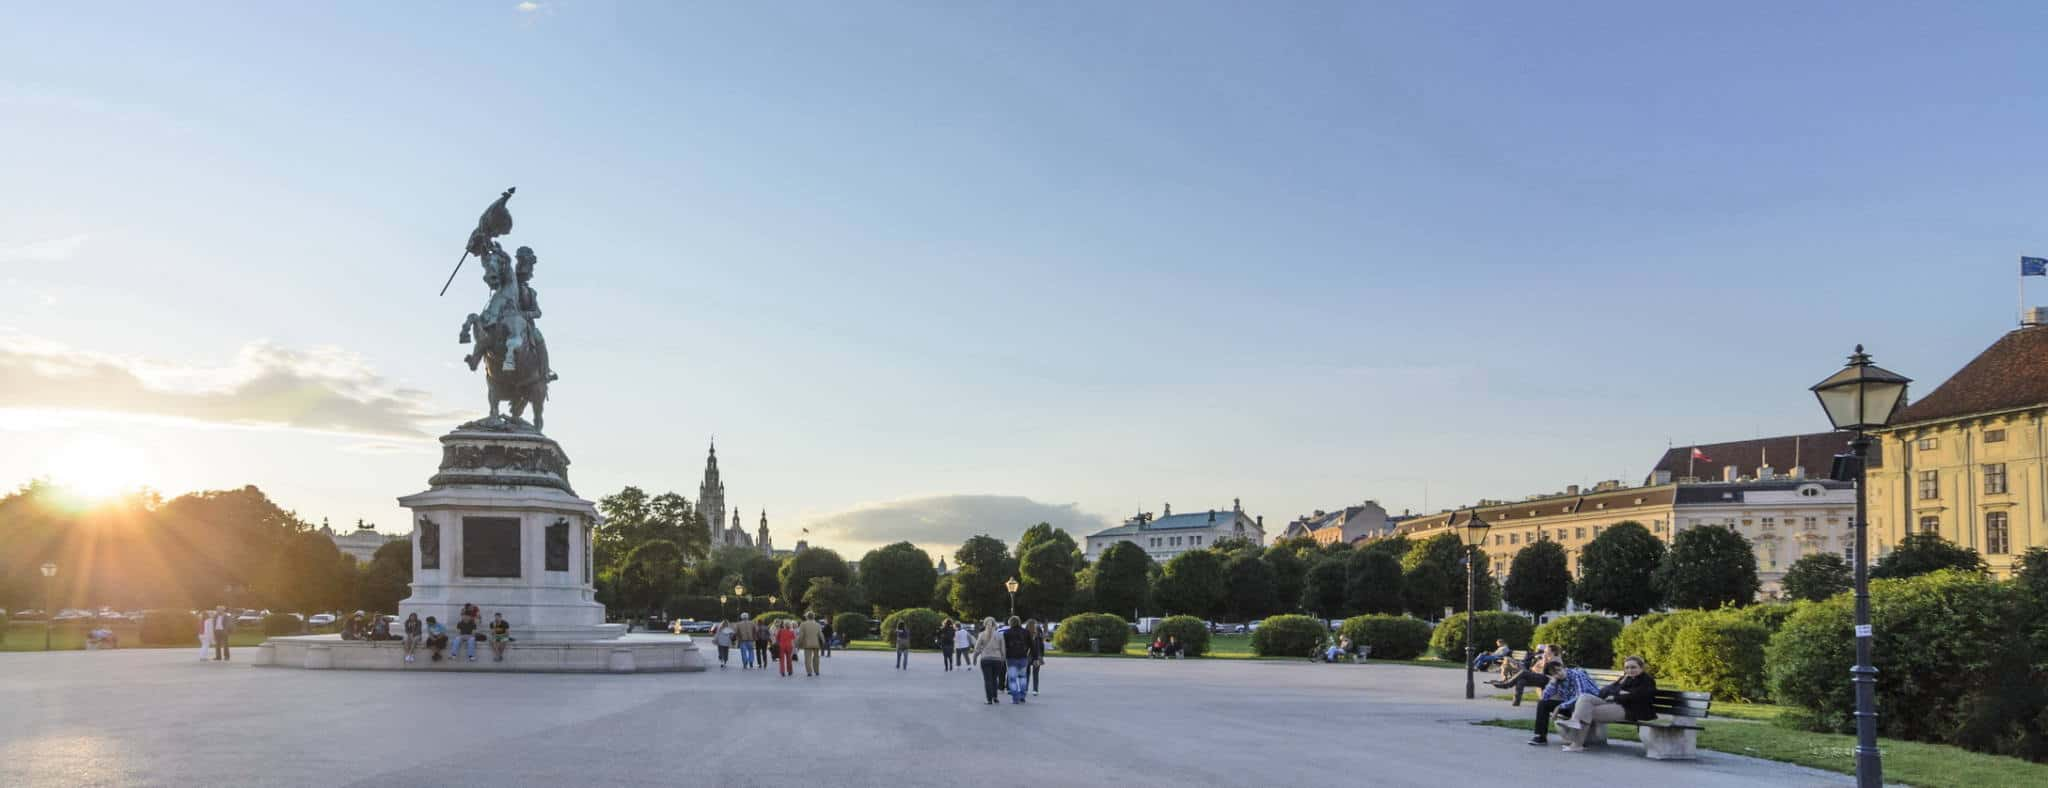 Heldenplatz i Wien Österreich Österrike